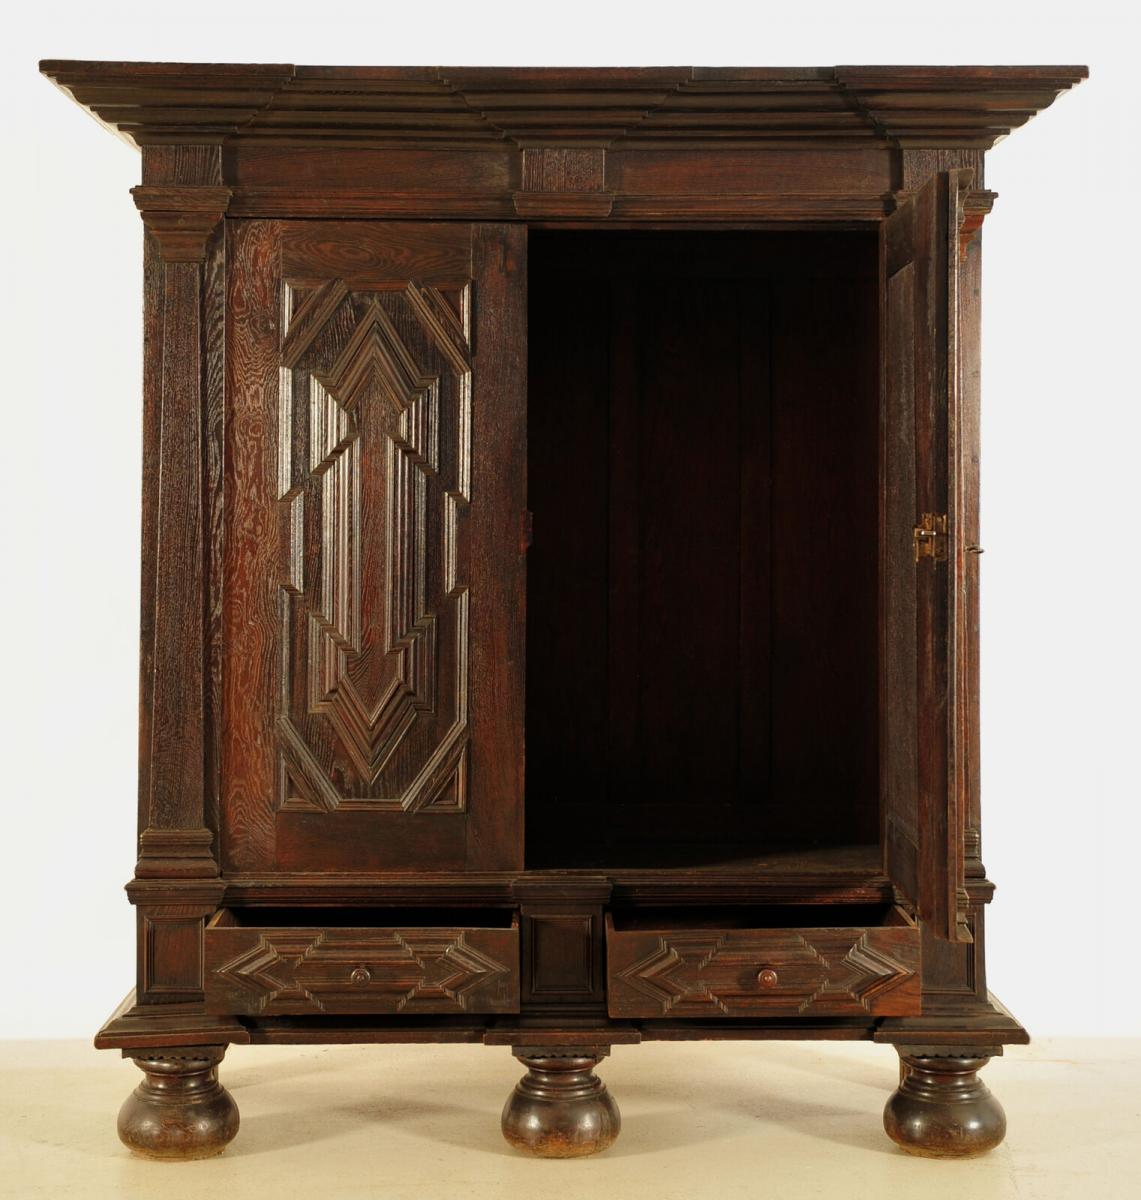 Originaler westfälischer Barockschrank gefertigt um 1730 Antik Kolosseum 1